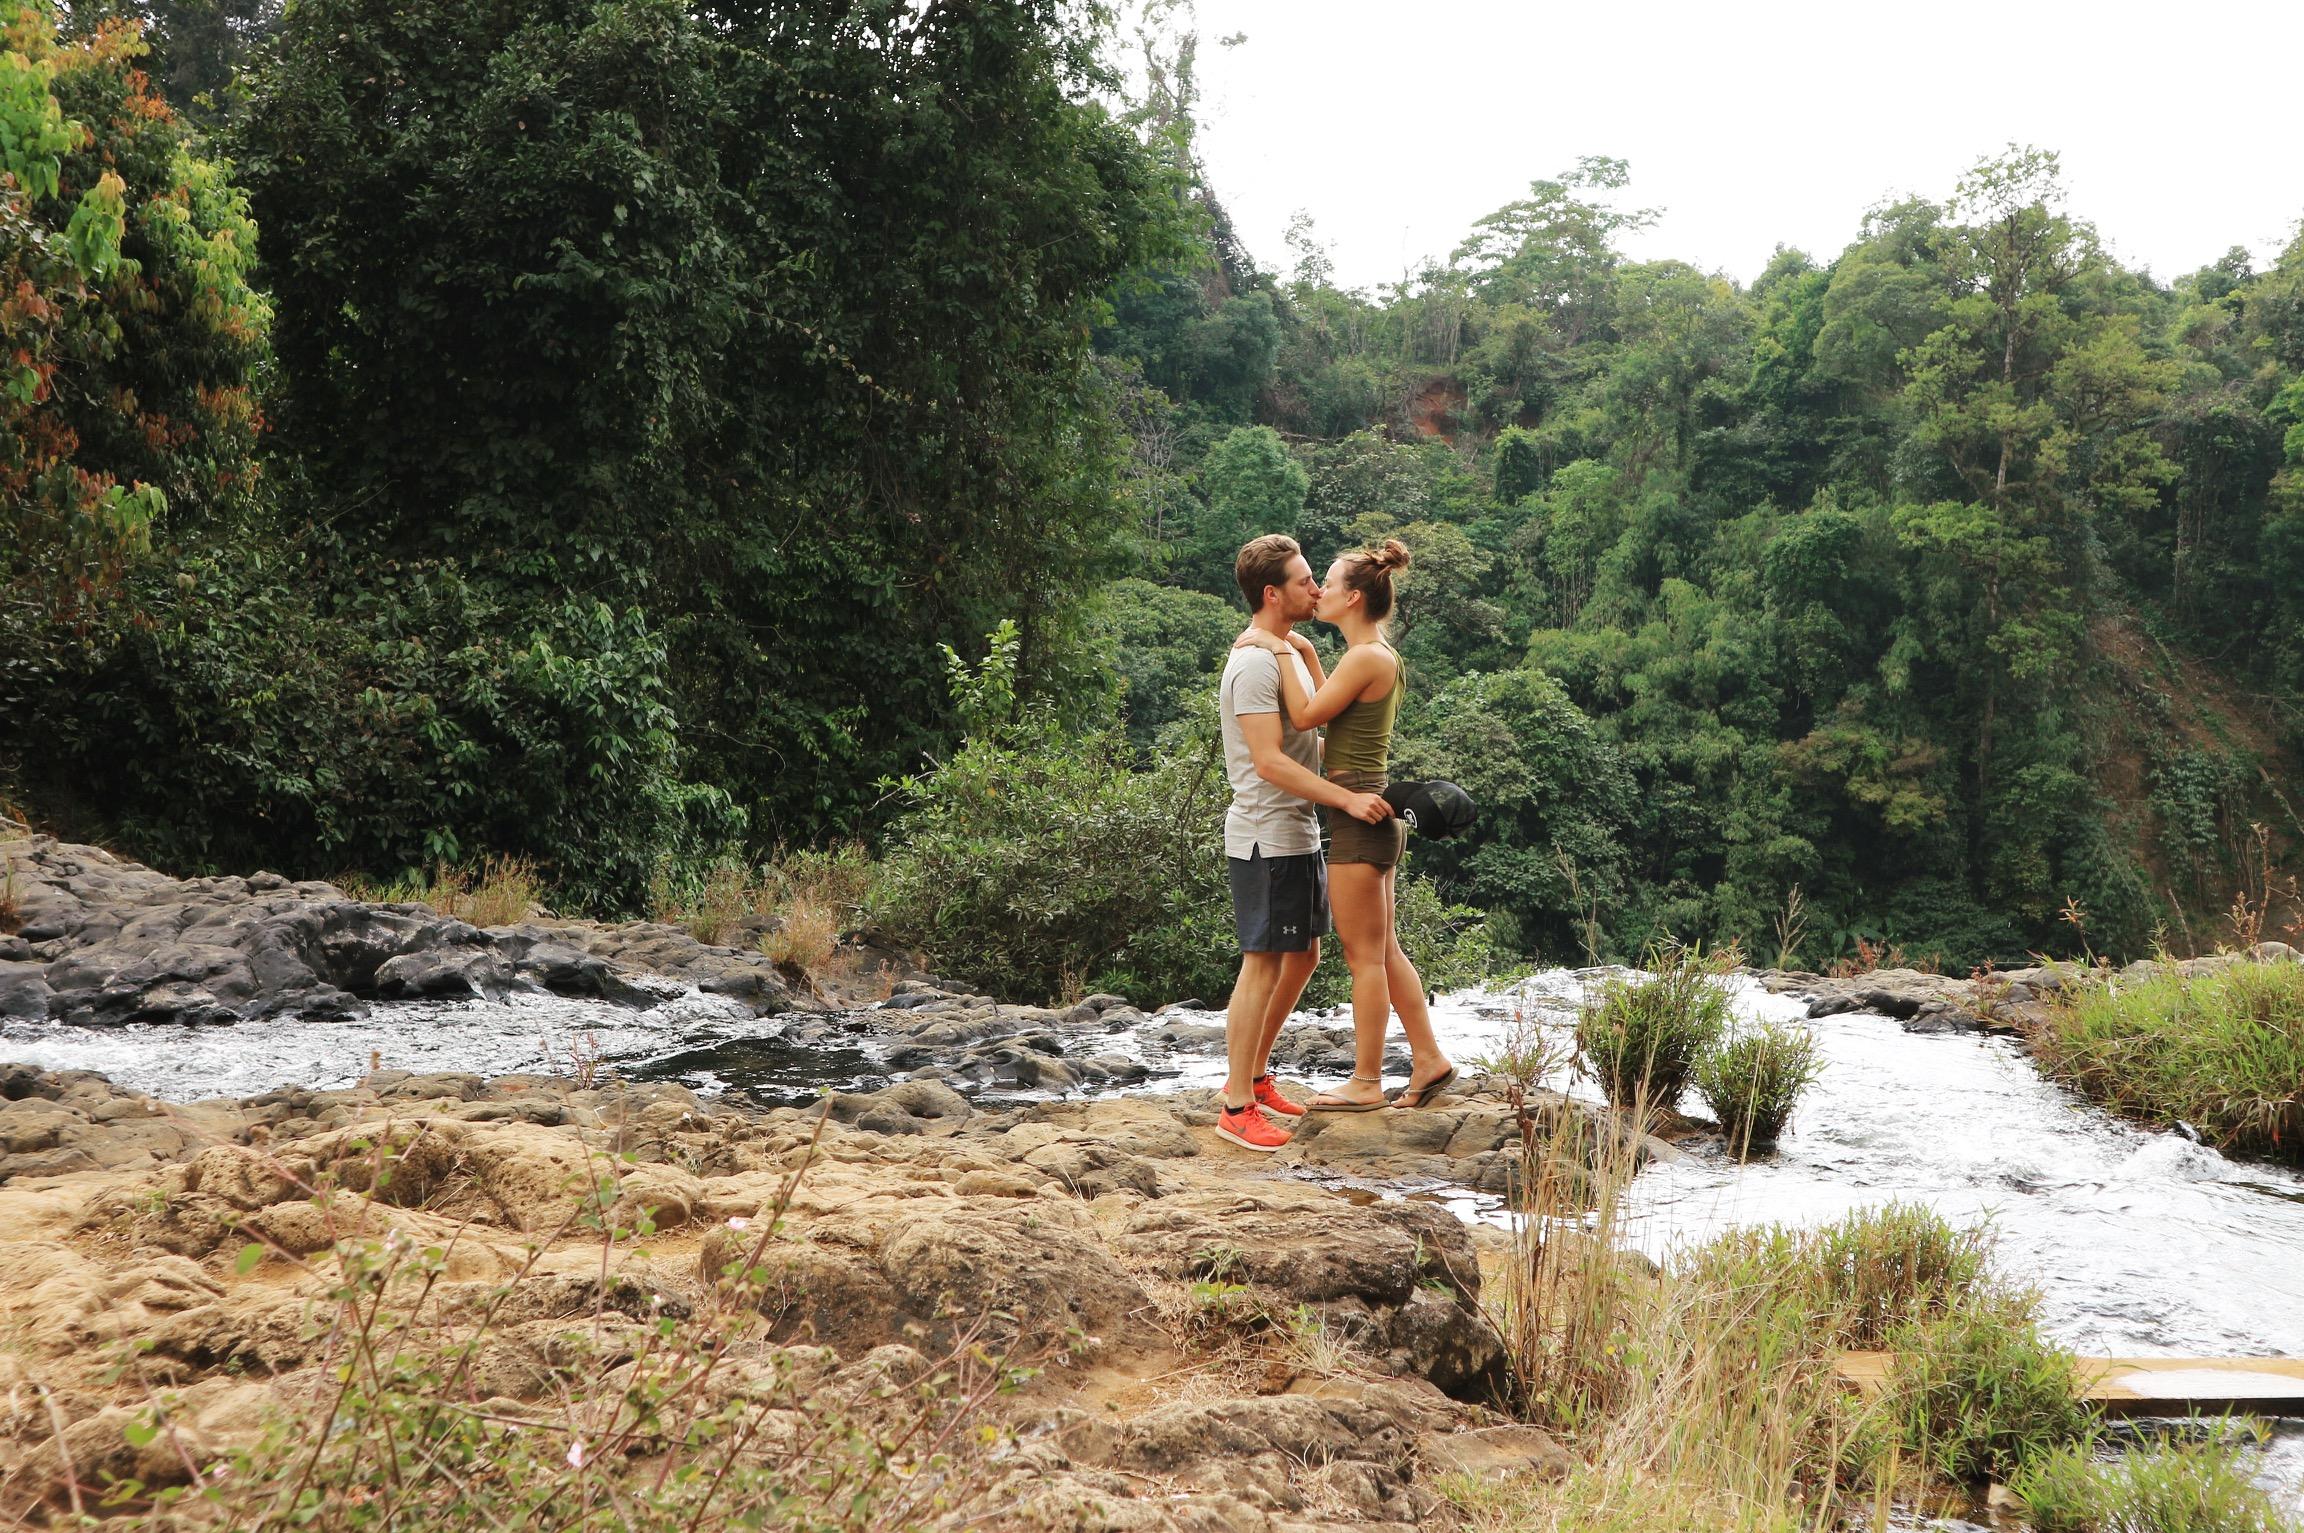 Laos, wereldreis, reizen, travel, wanderlust, couple, backpack, lifestyle, world, earth, fitfam, fitdutchies, goals, beach, sun, fun